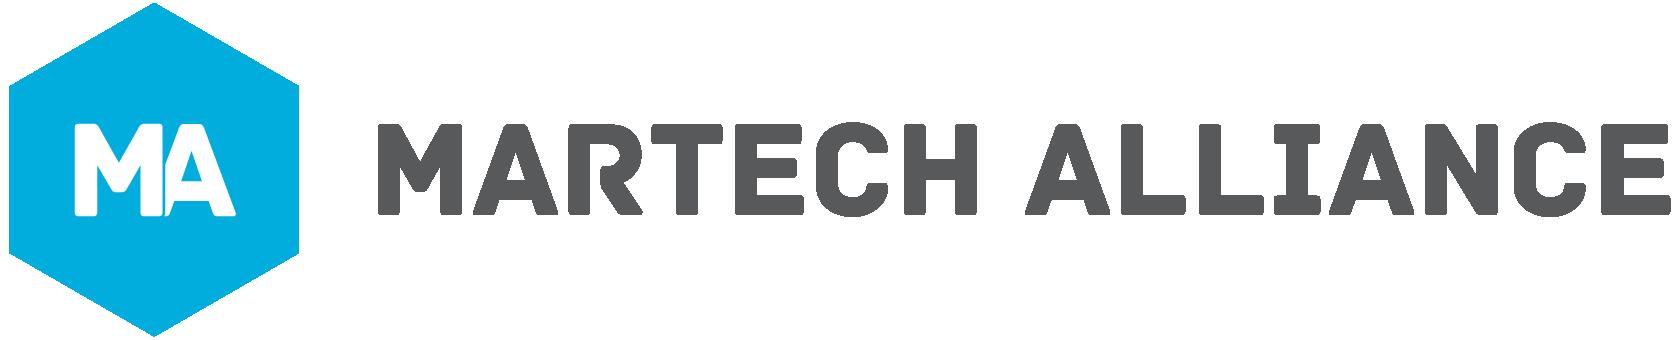 Martech Alliance - Logos_5.0 Landscape Logo copy